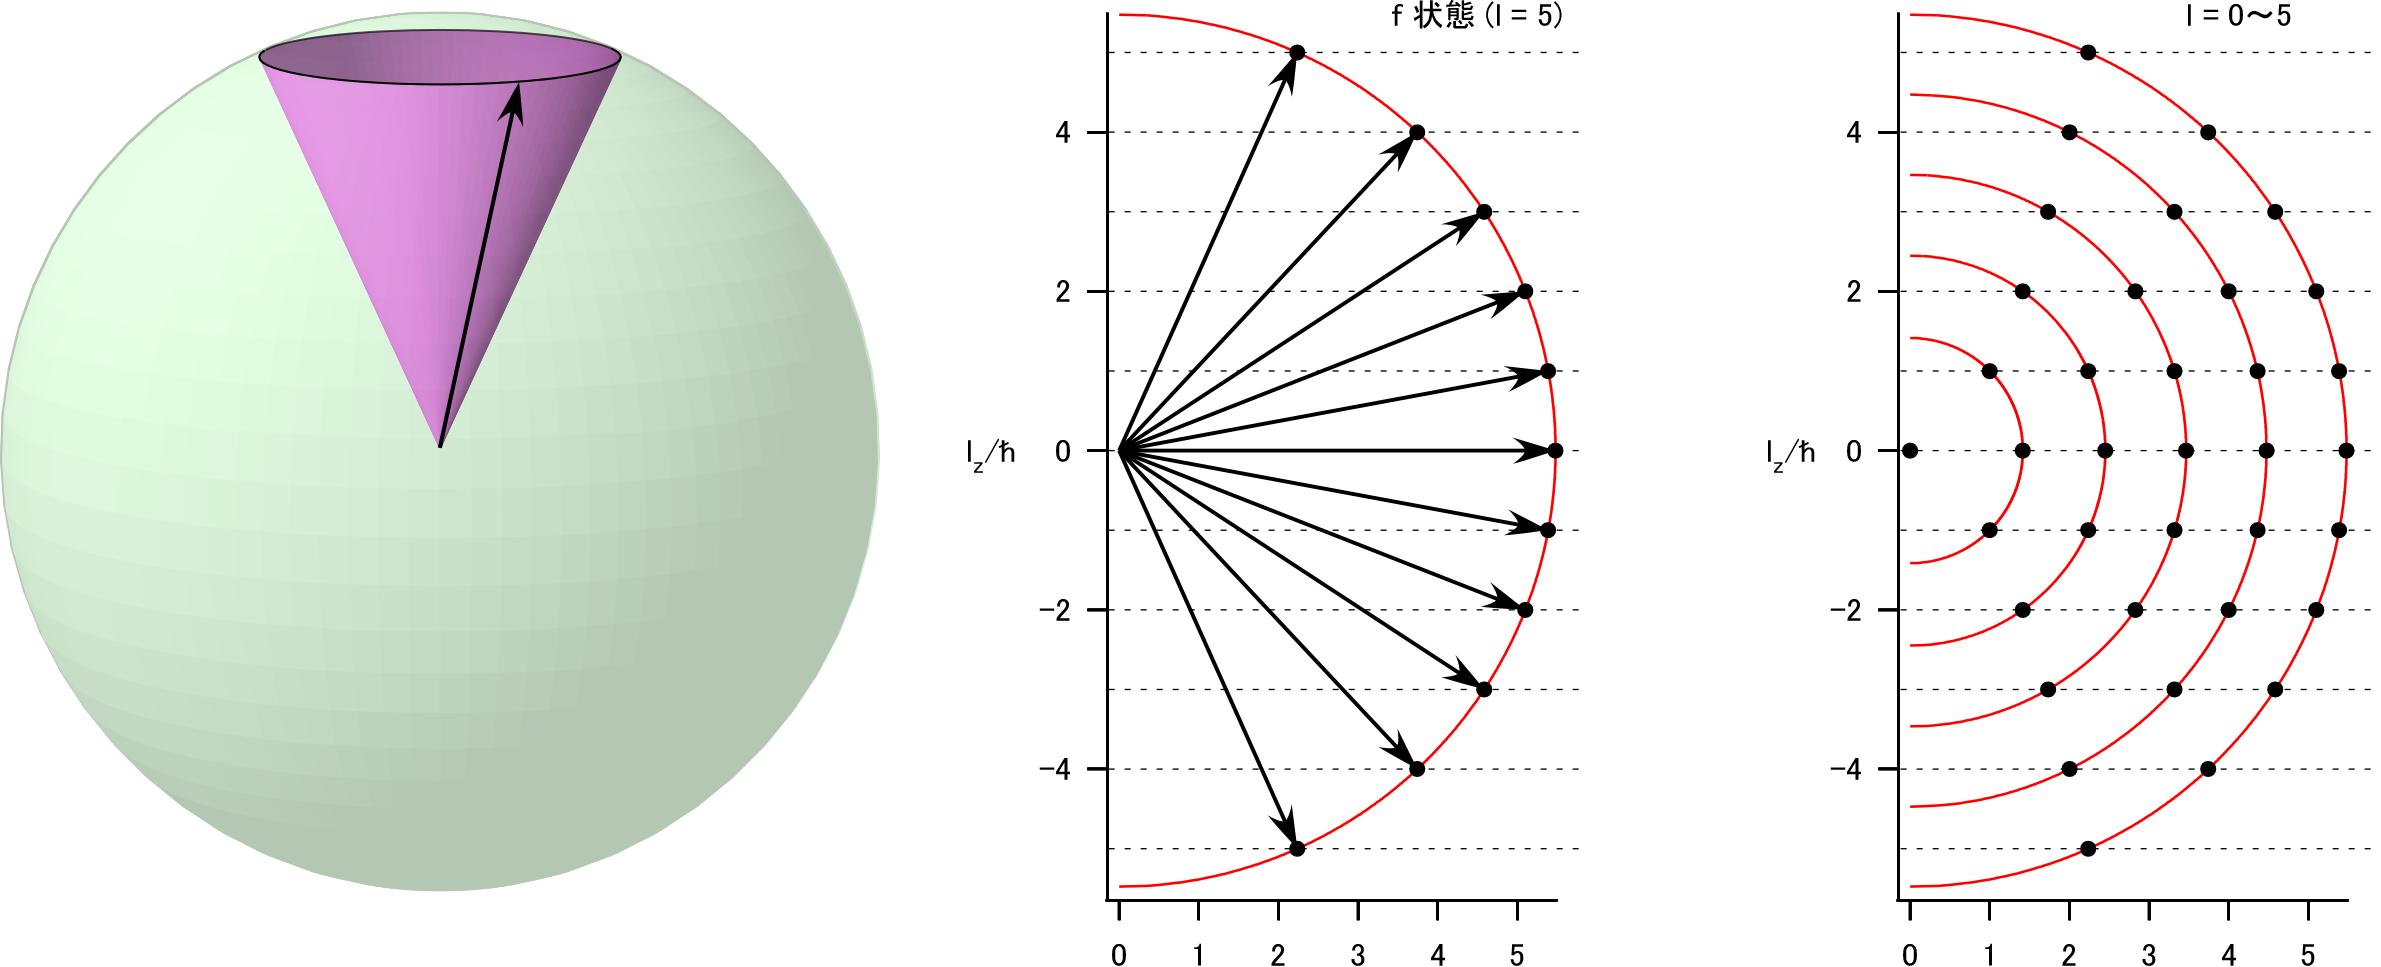 spherical-harmonics-angular-momentum.png